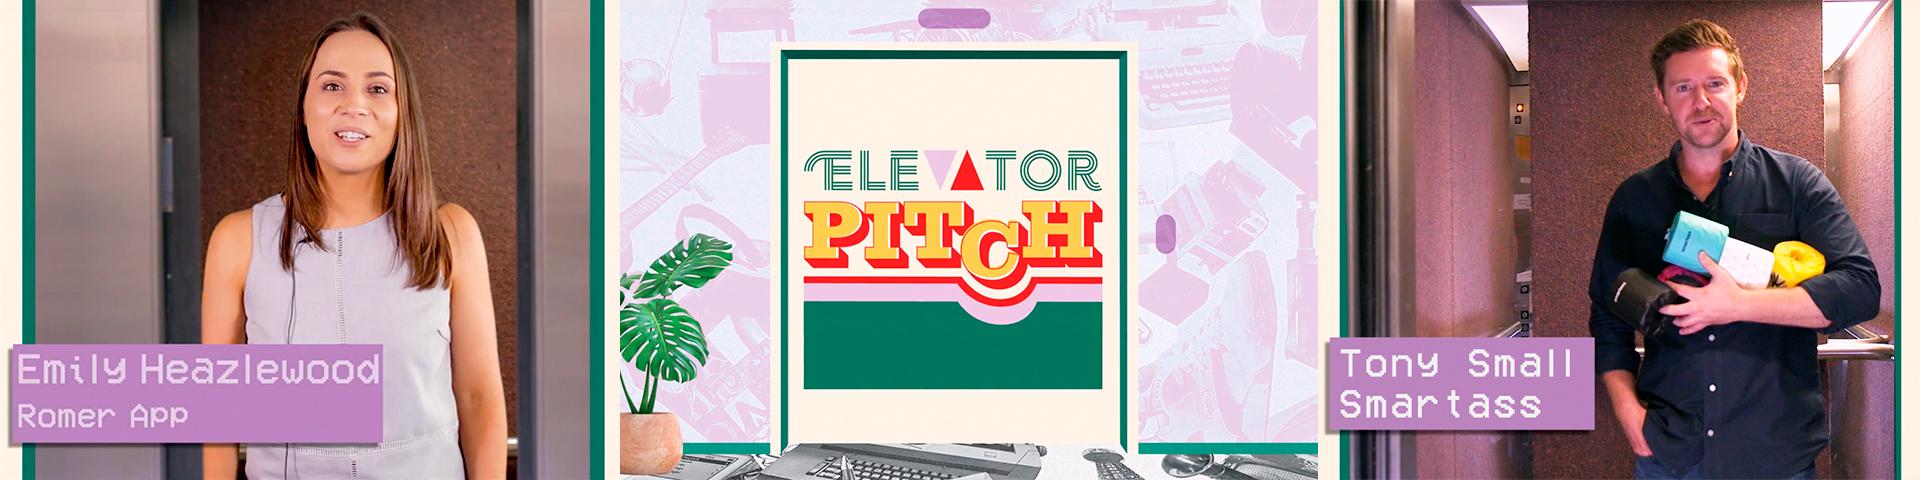 Idealog's Elevator Pitch